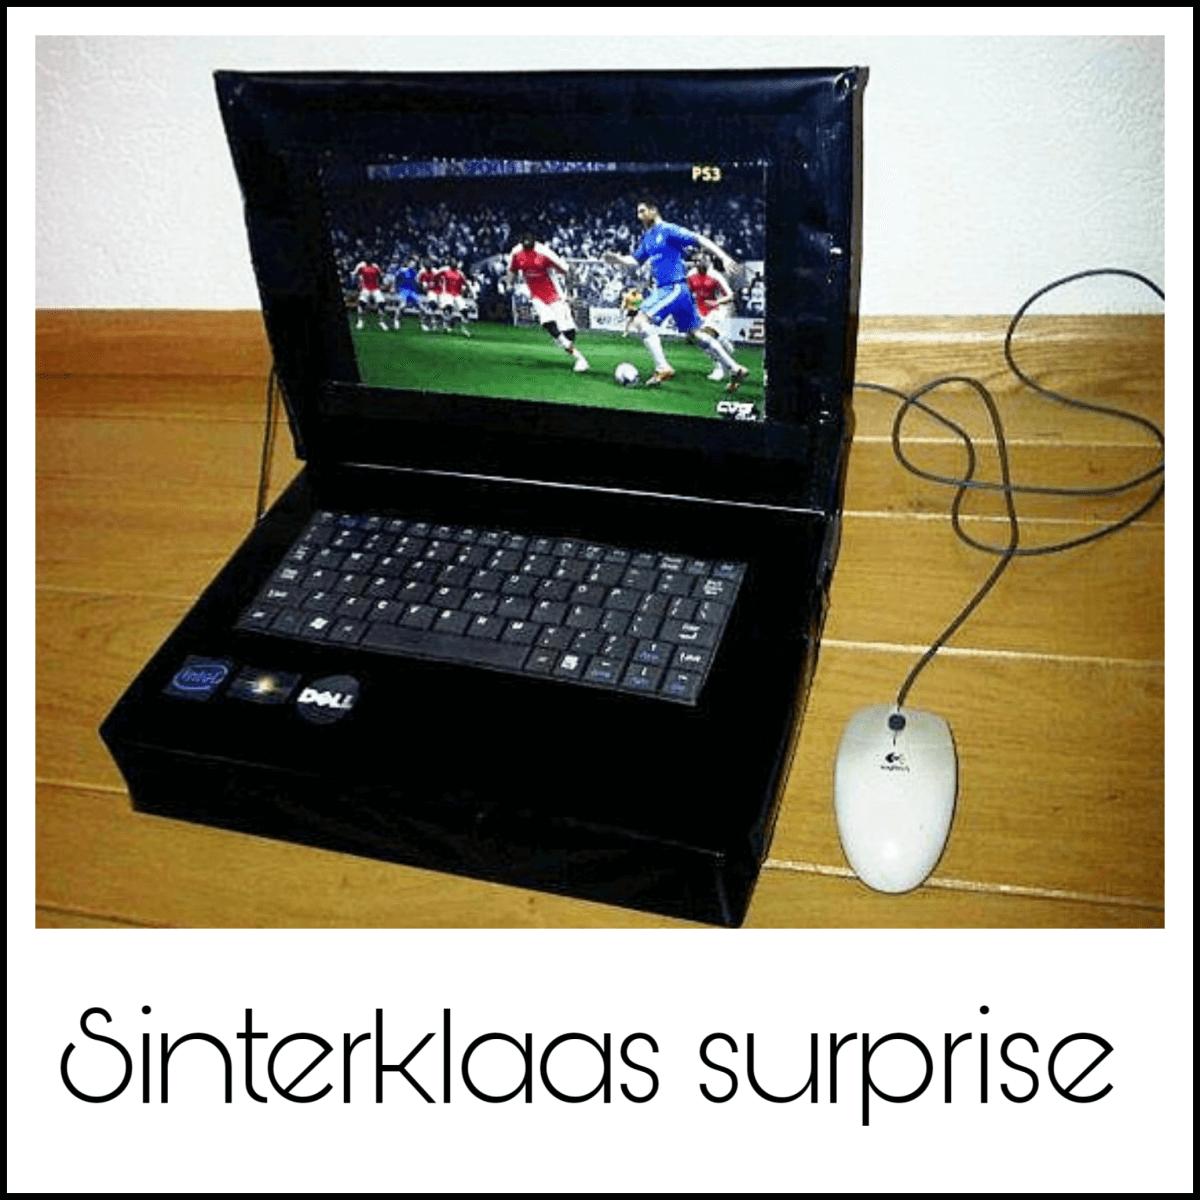 Sinterklaas surprise laptop computer